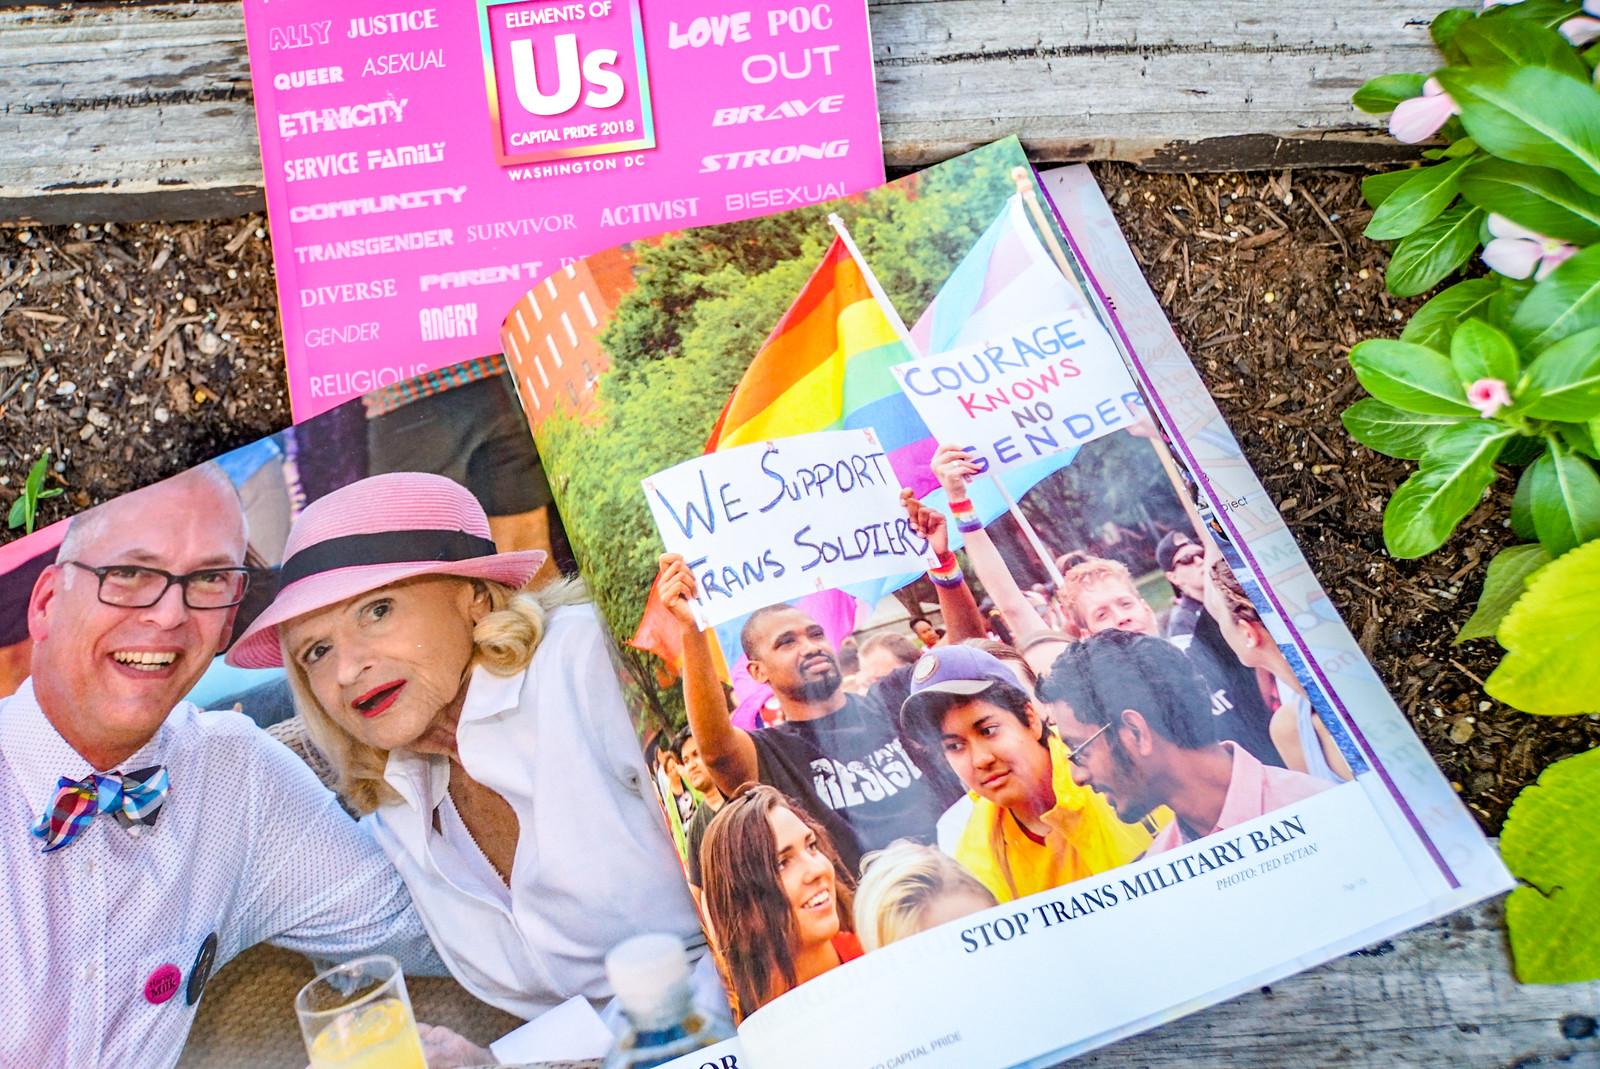 2018.06.04 Capital Pride People and Places, Washington, DC USA 02774